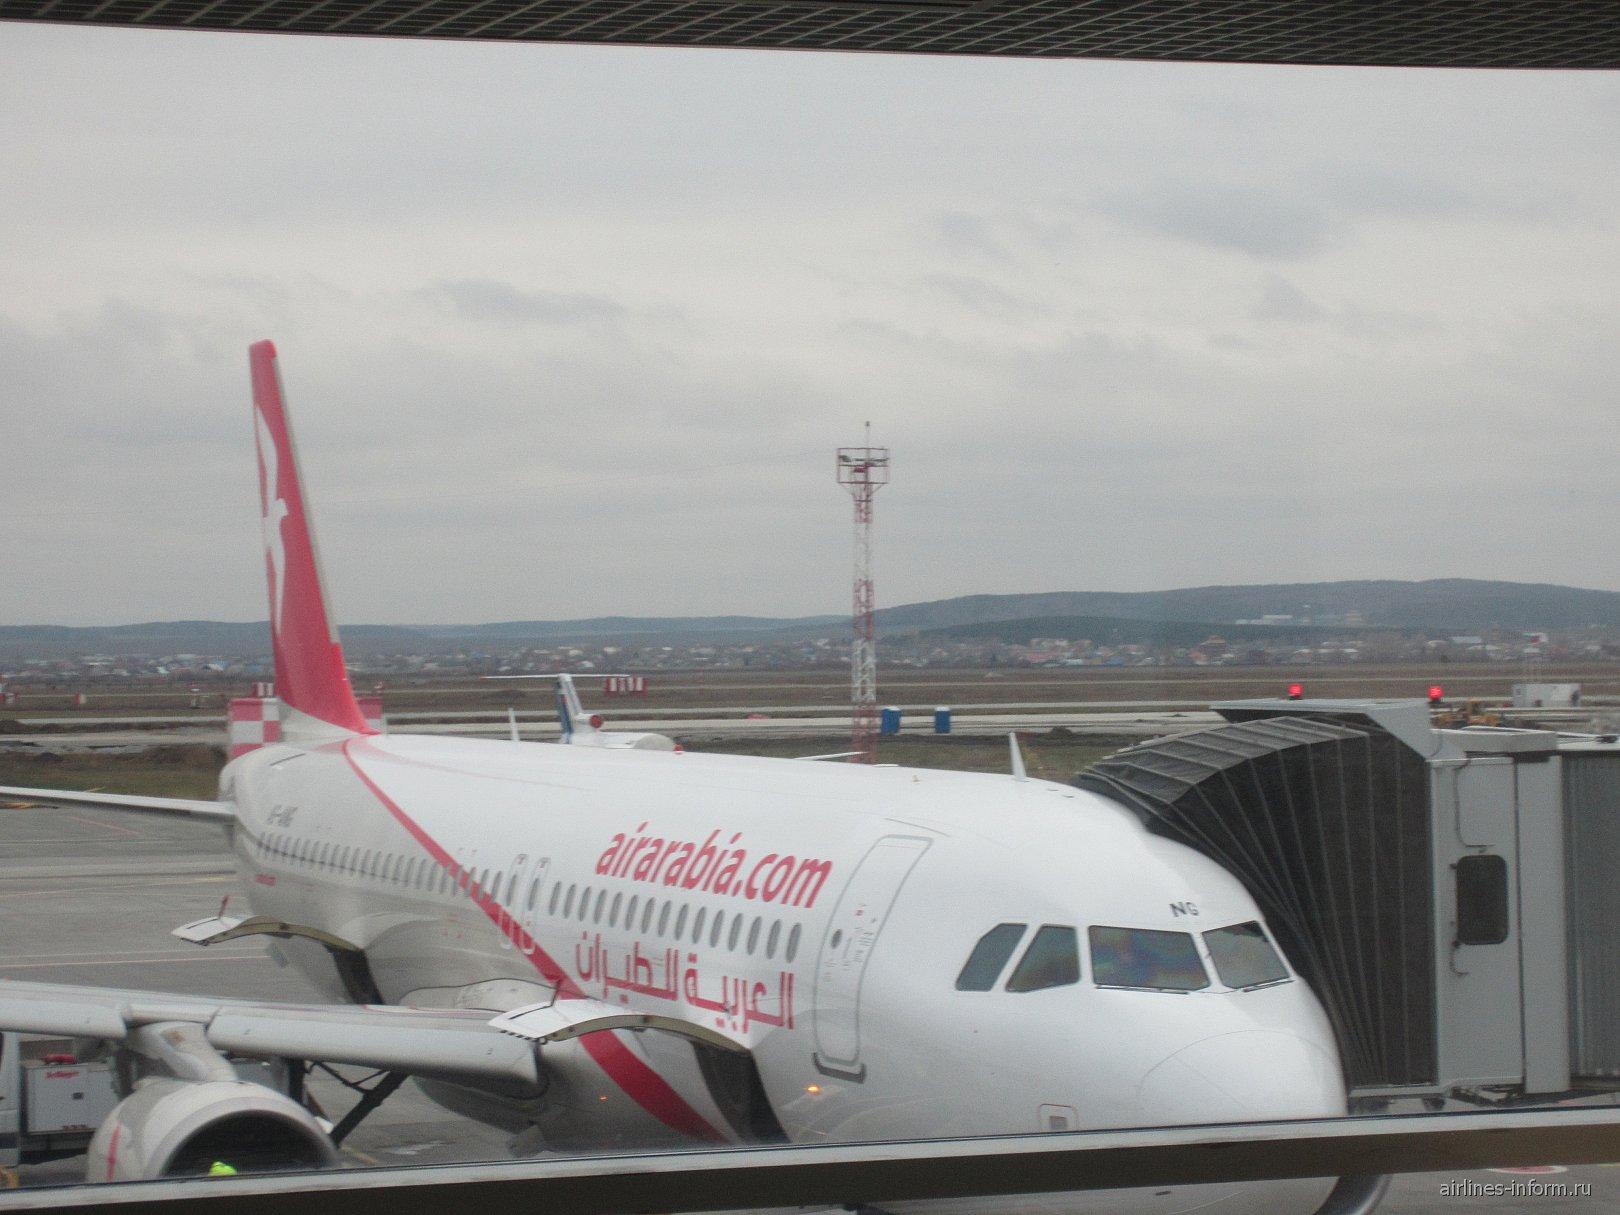 Посадка на рейс Екатеринбург-Шарджа авиакомпании Air Arabia